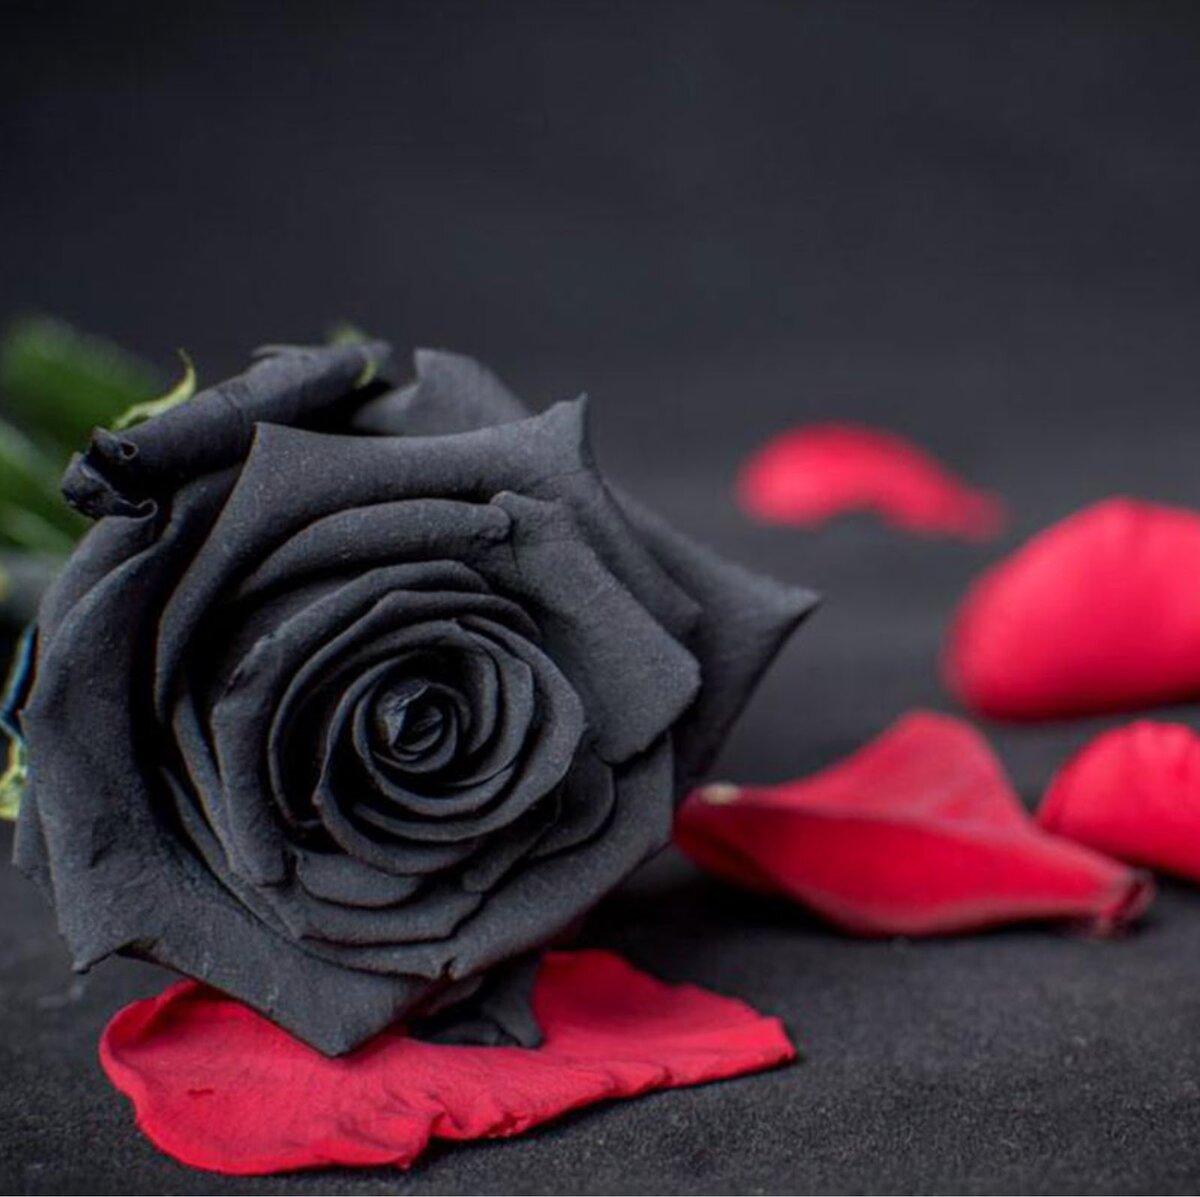 картинки чорних троянд предприятие